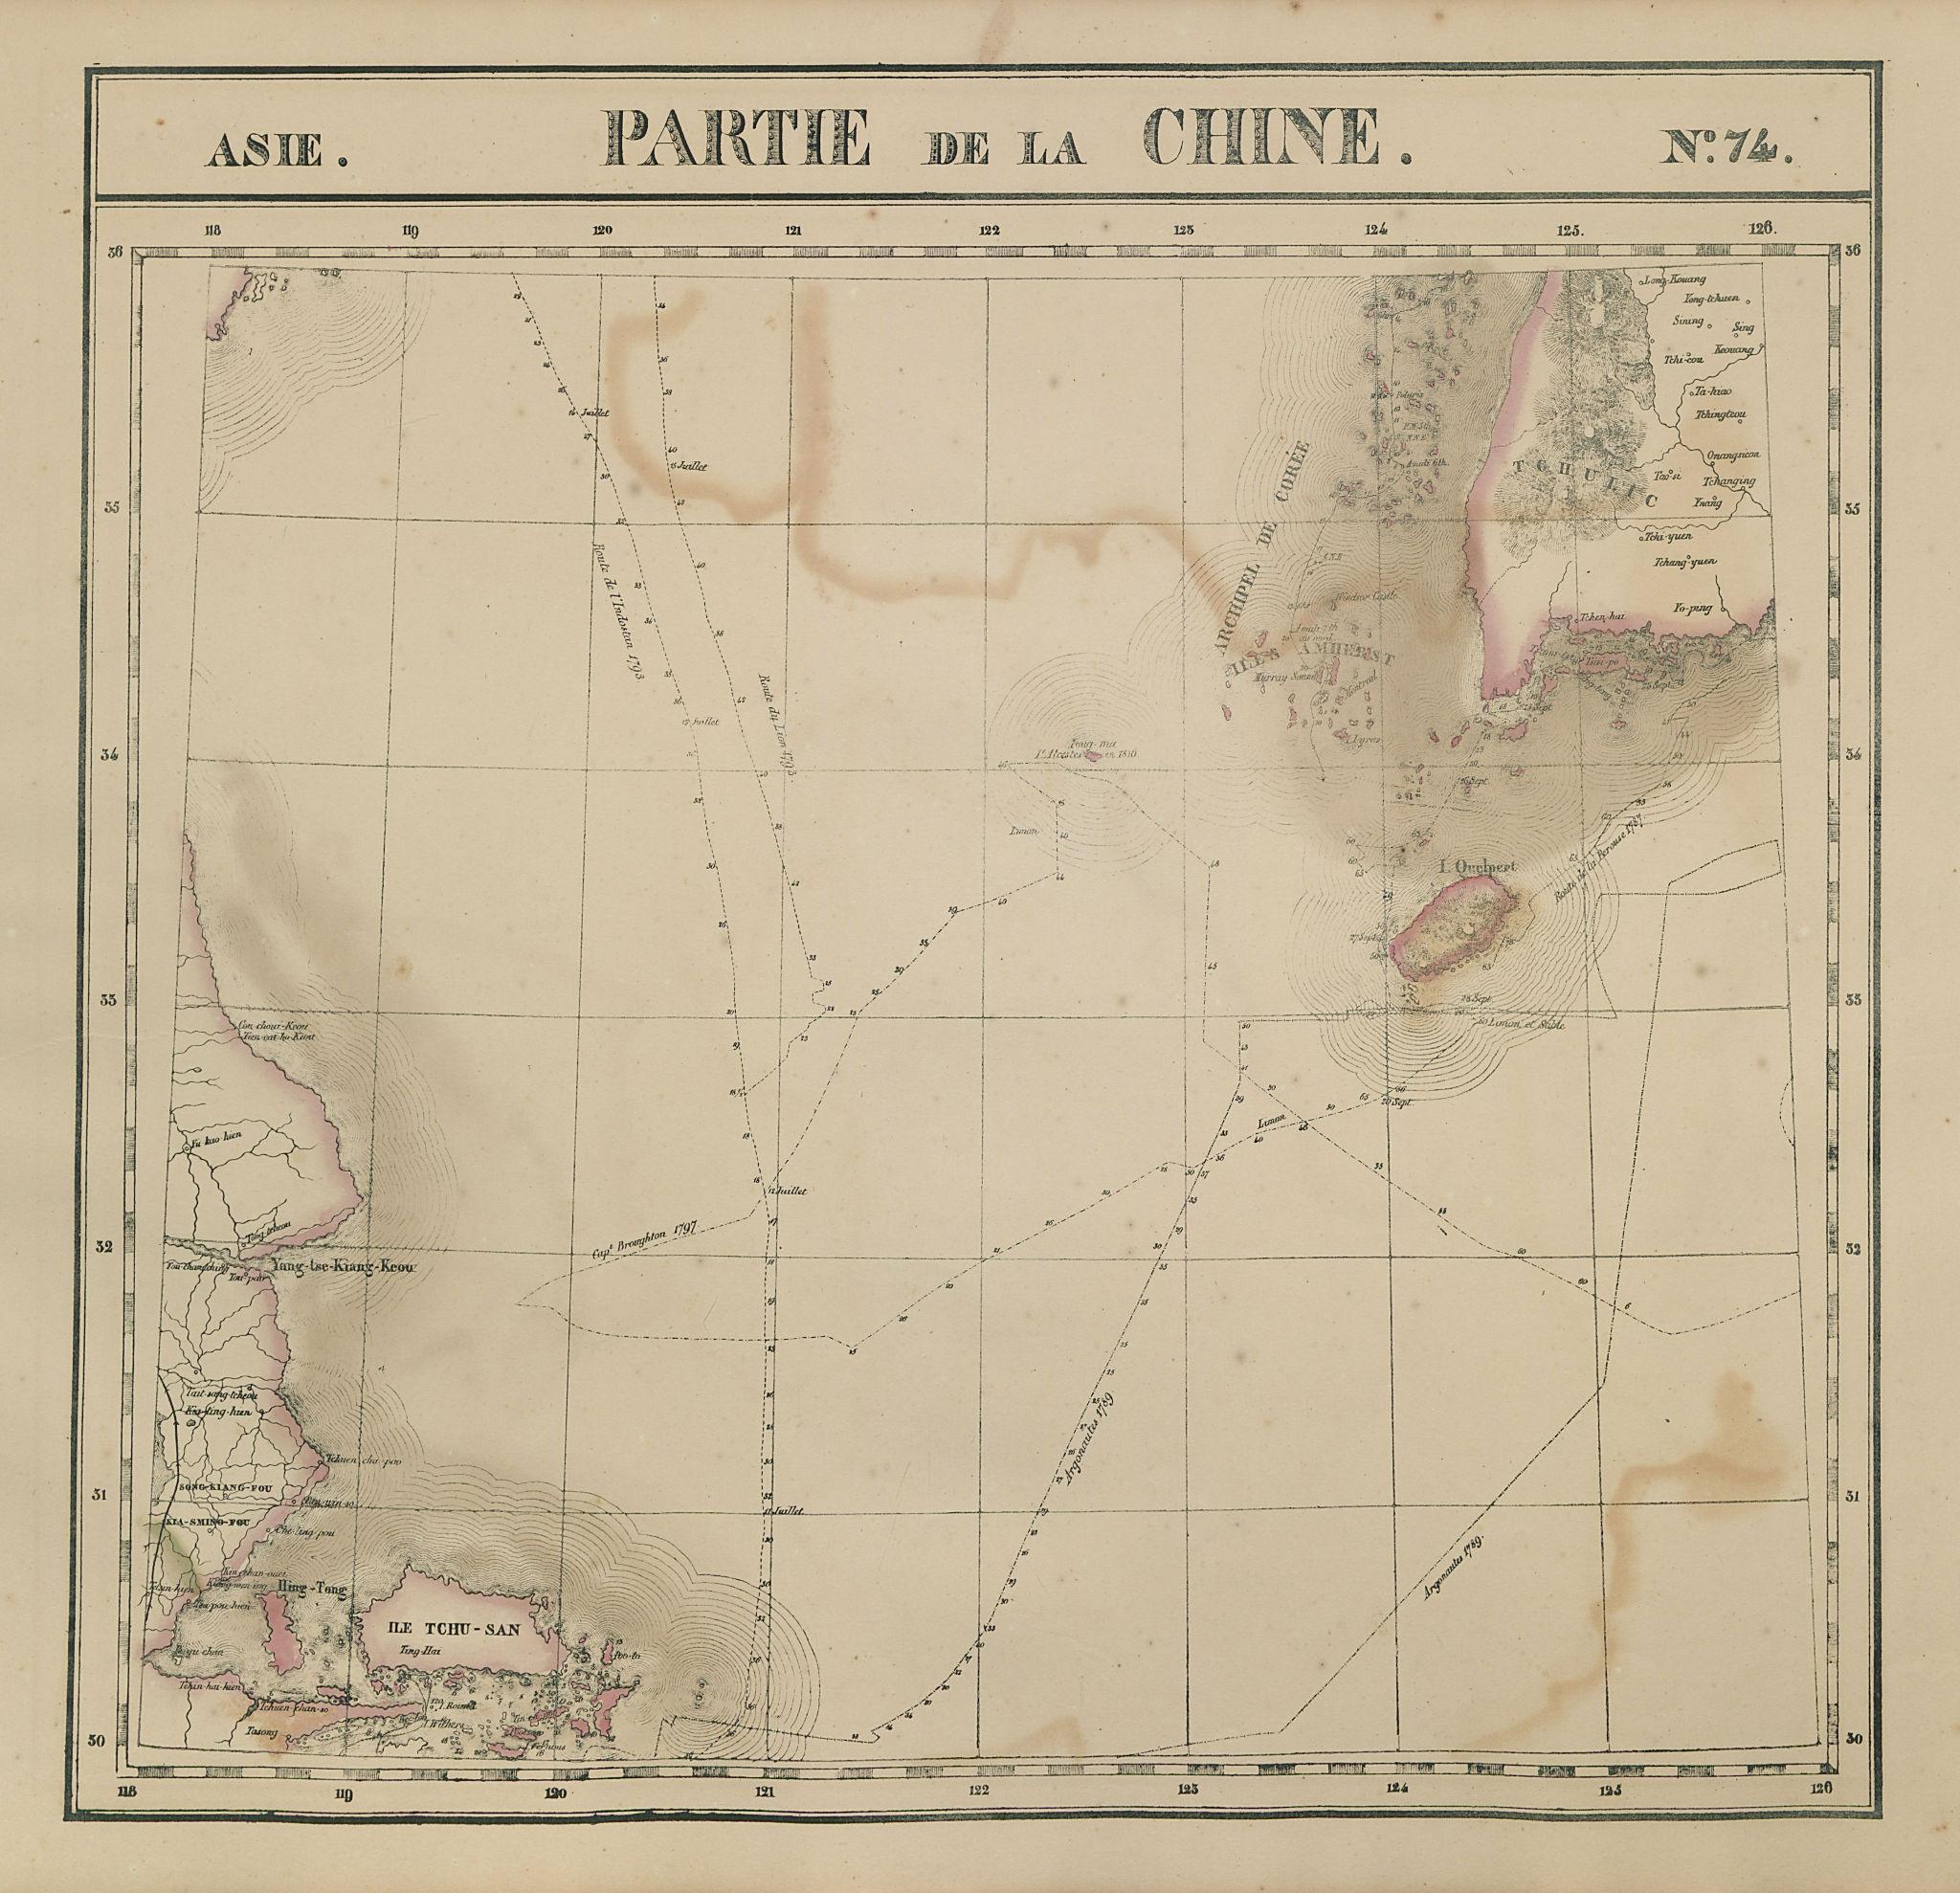 Asie. Chine #74 China Jiangsu Zhejiang. SW Korea. VANDERMAELEN 1827 old map